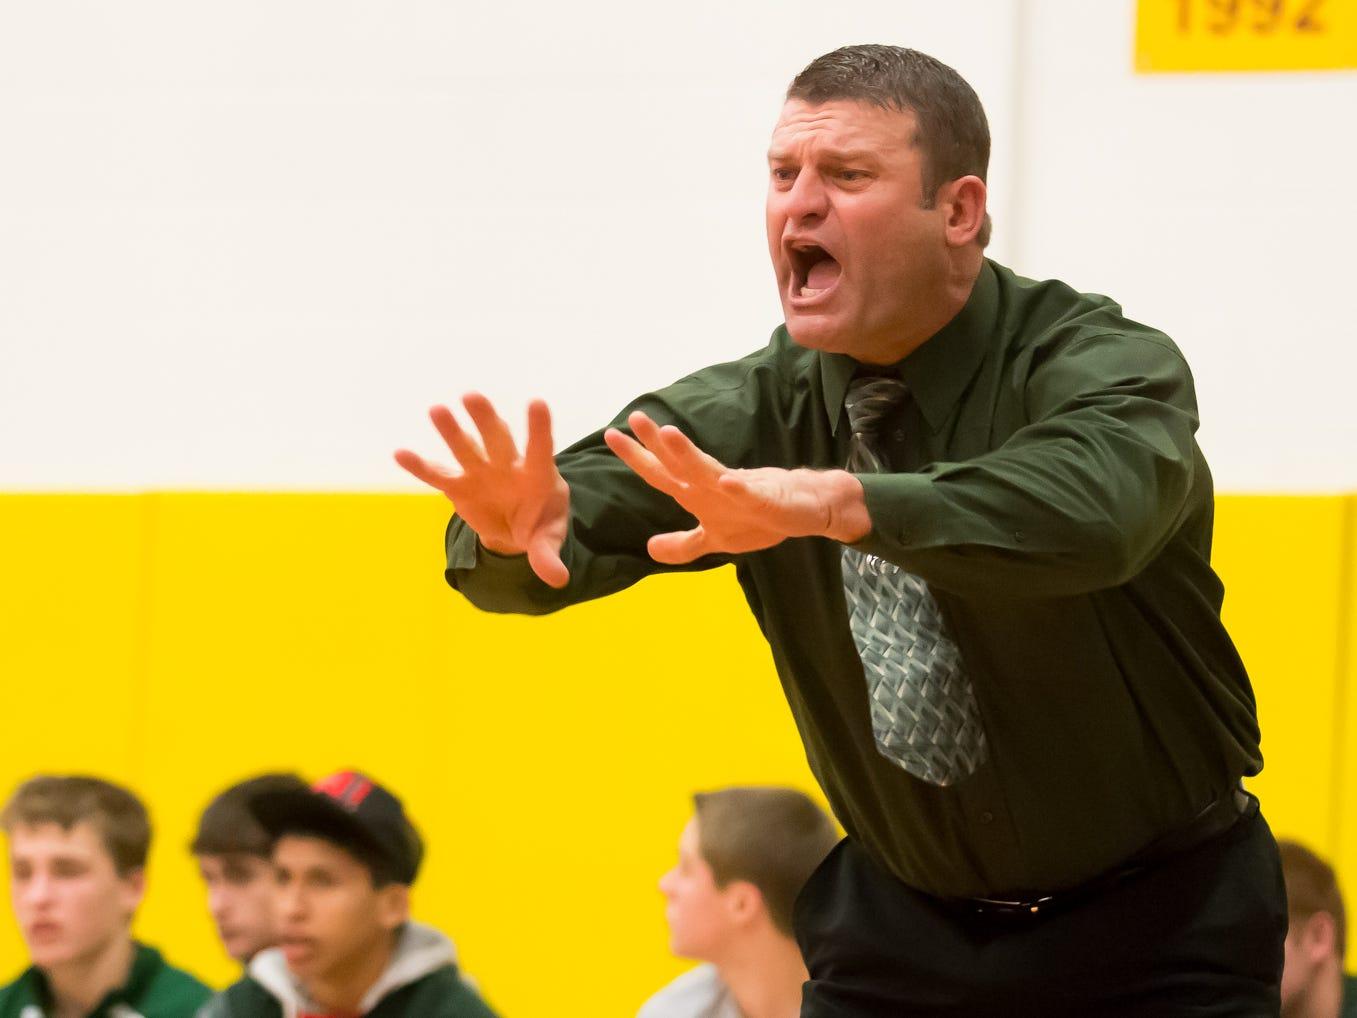 Brian Killion has resigned as the wrestling coach at Fossil Ridge High School.